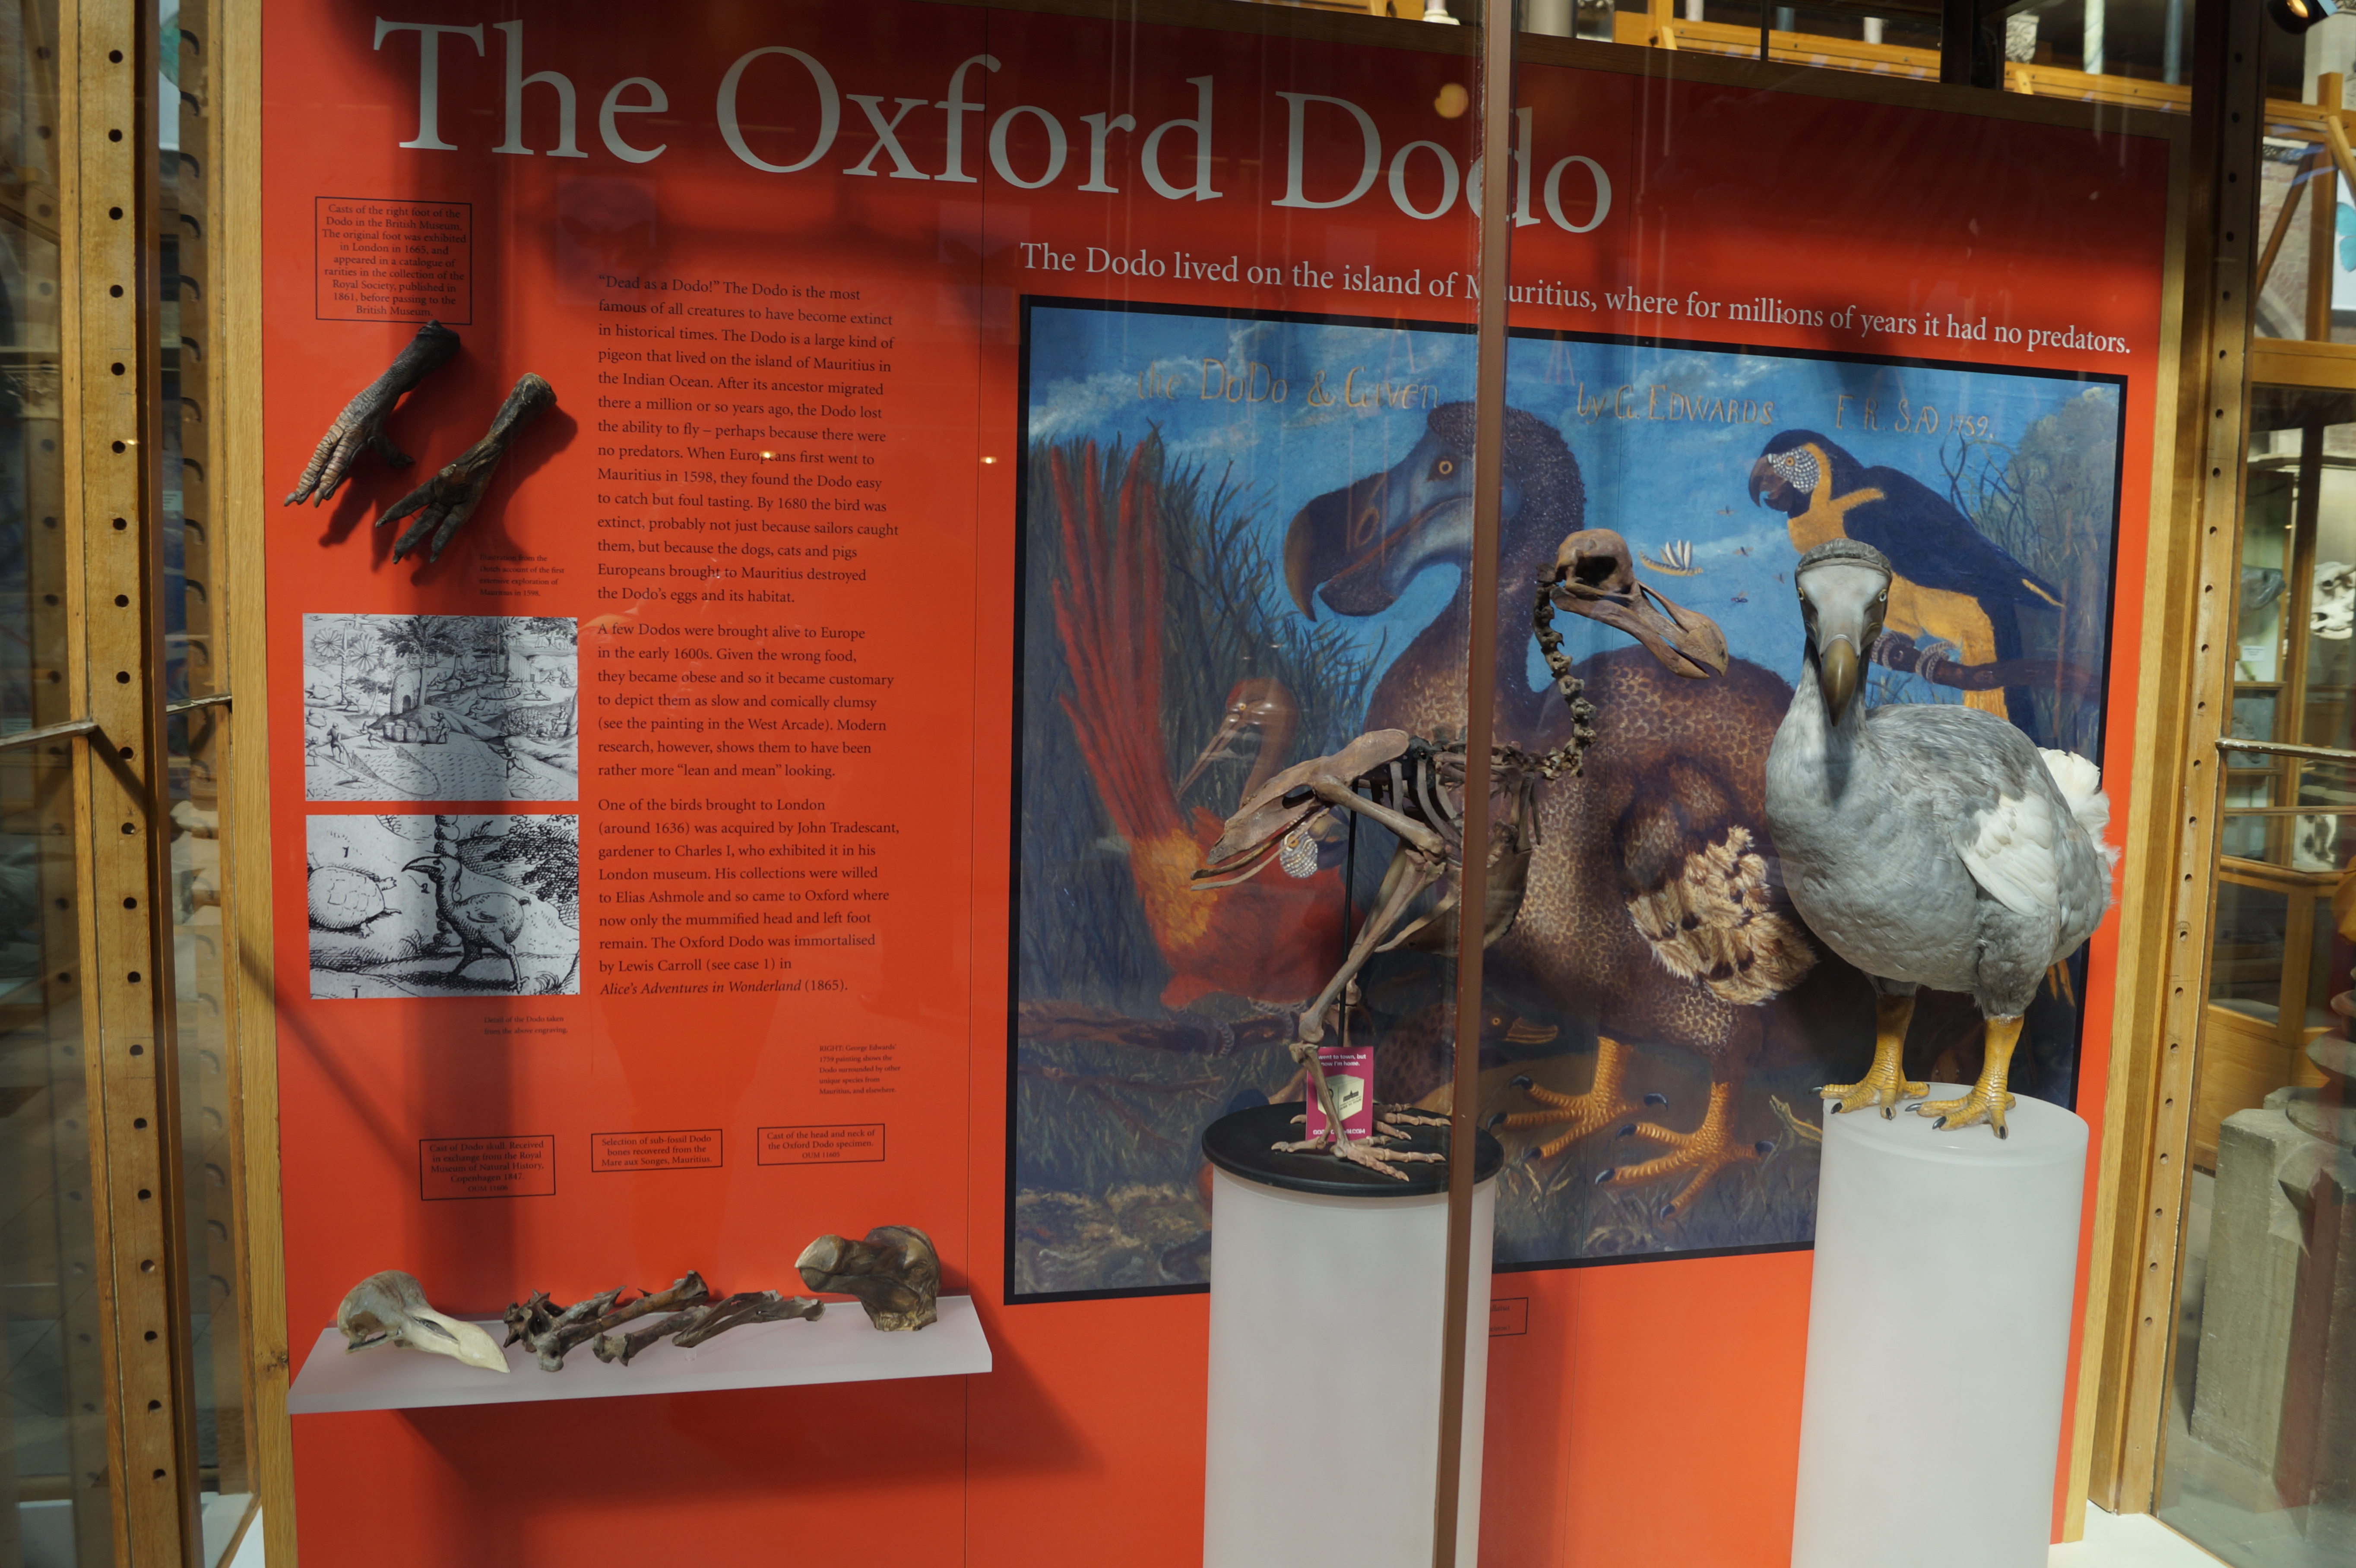 oxford-menni-kulfold-harry-potter